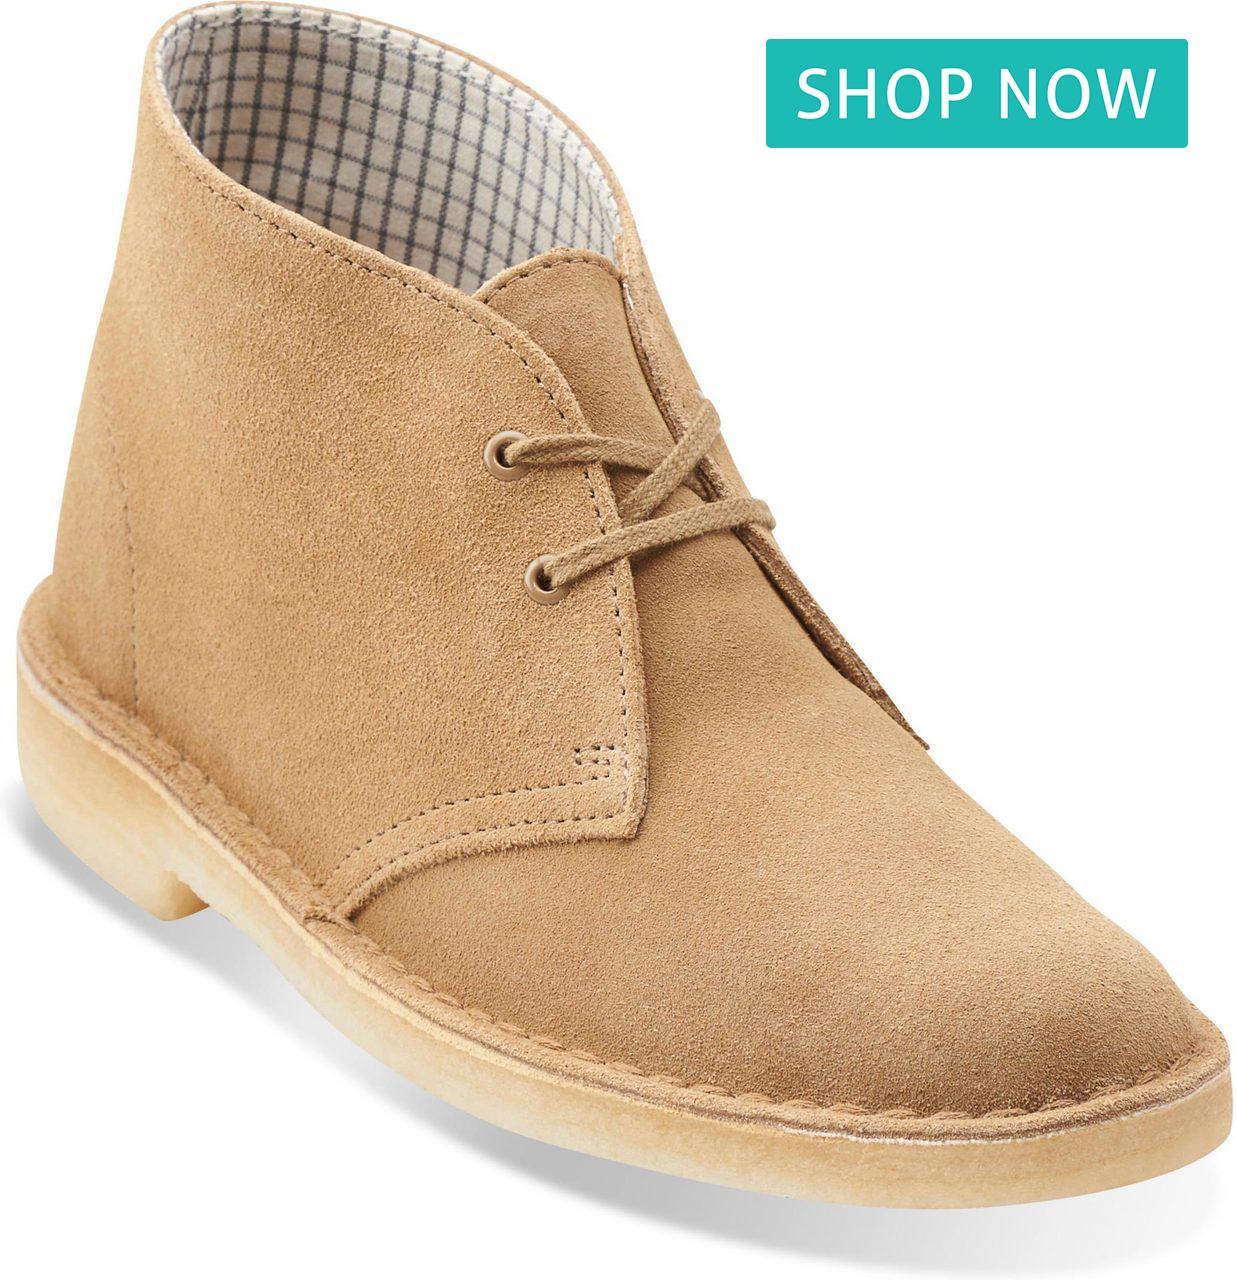 Clarks Women's Desert Boots in Oakwood Suede